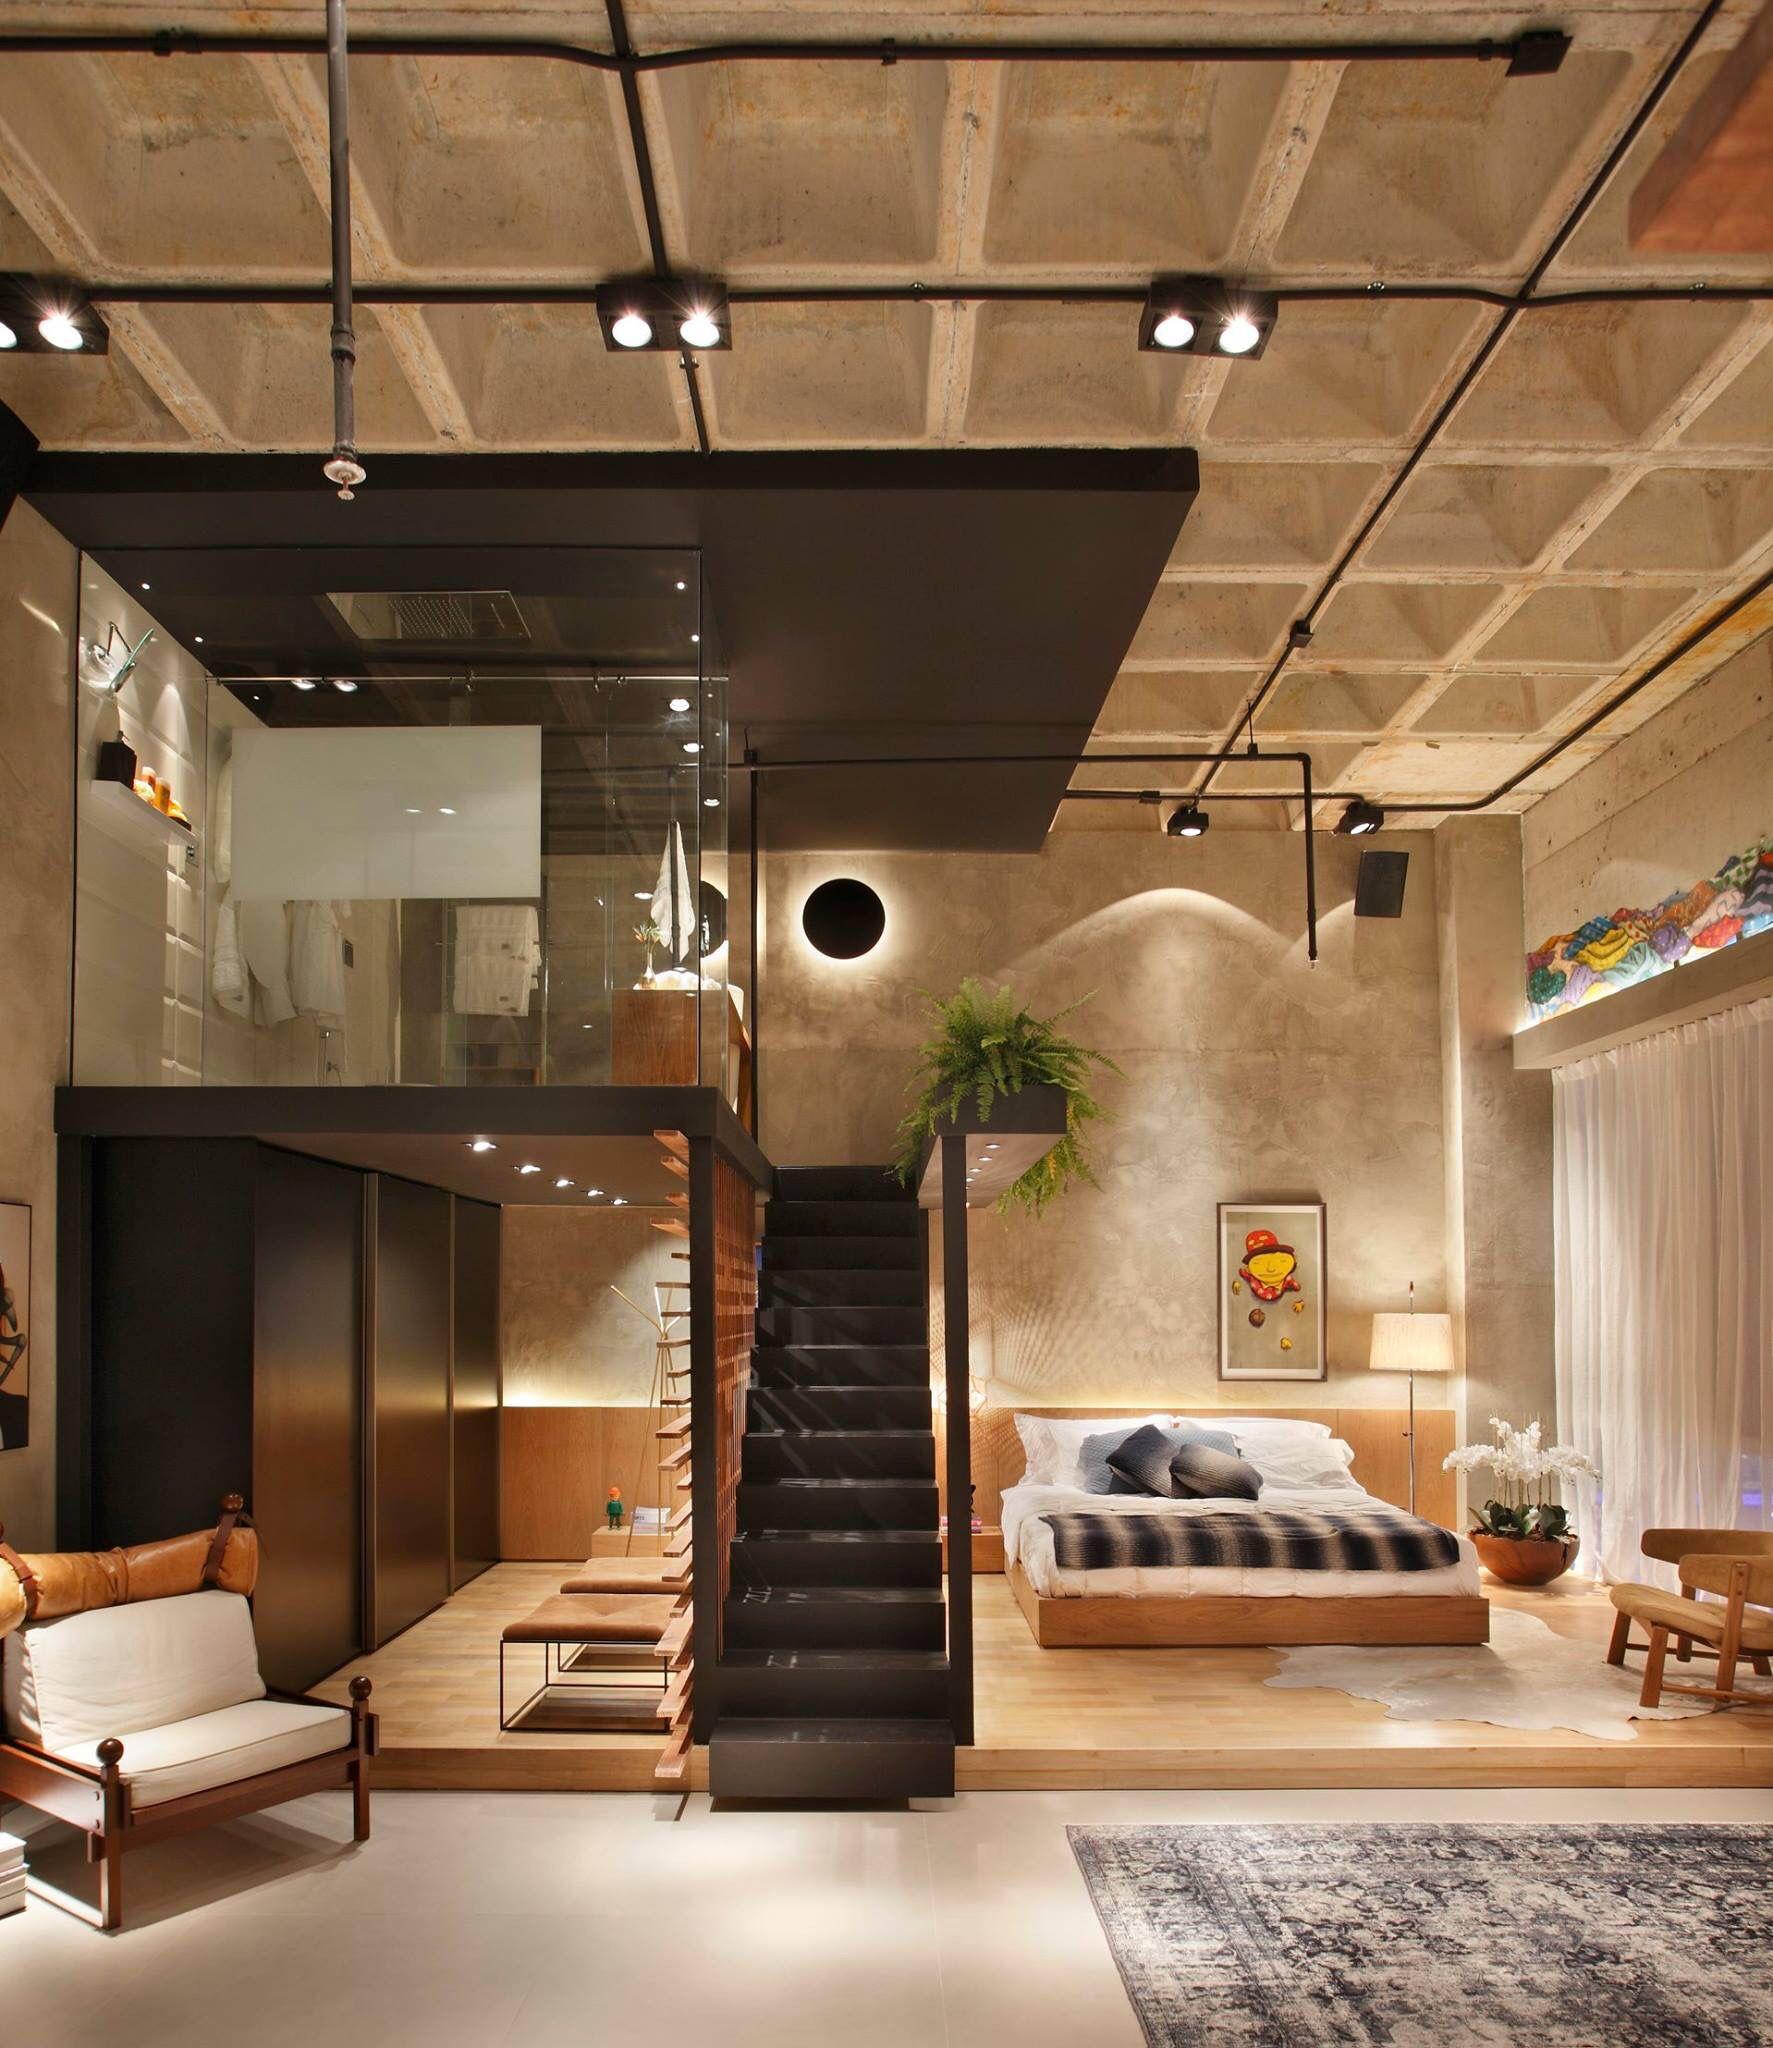 Loft casacor 2014 interiores pinterest escalera - Furnish decorador de interiores ...